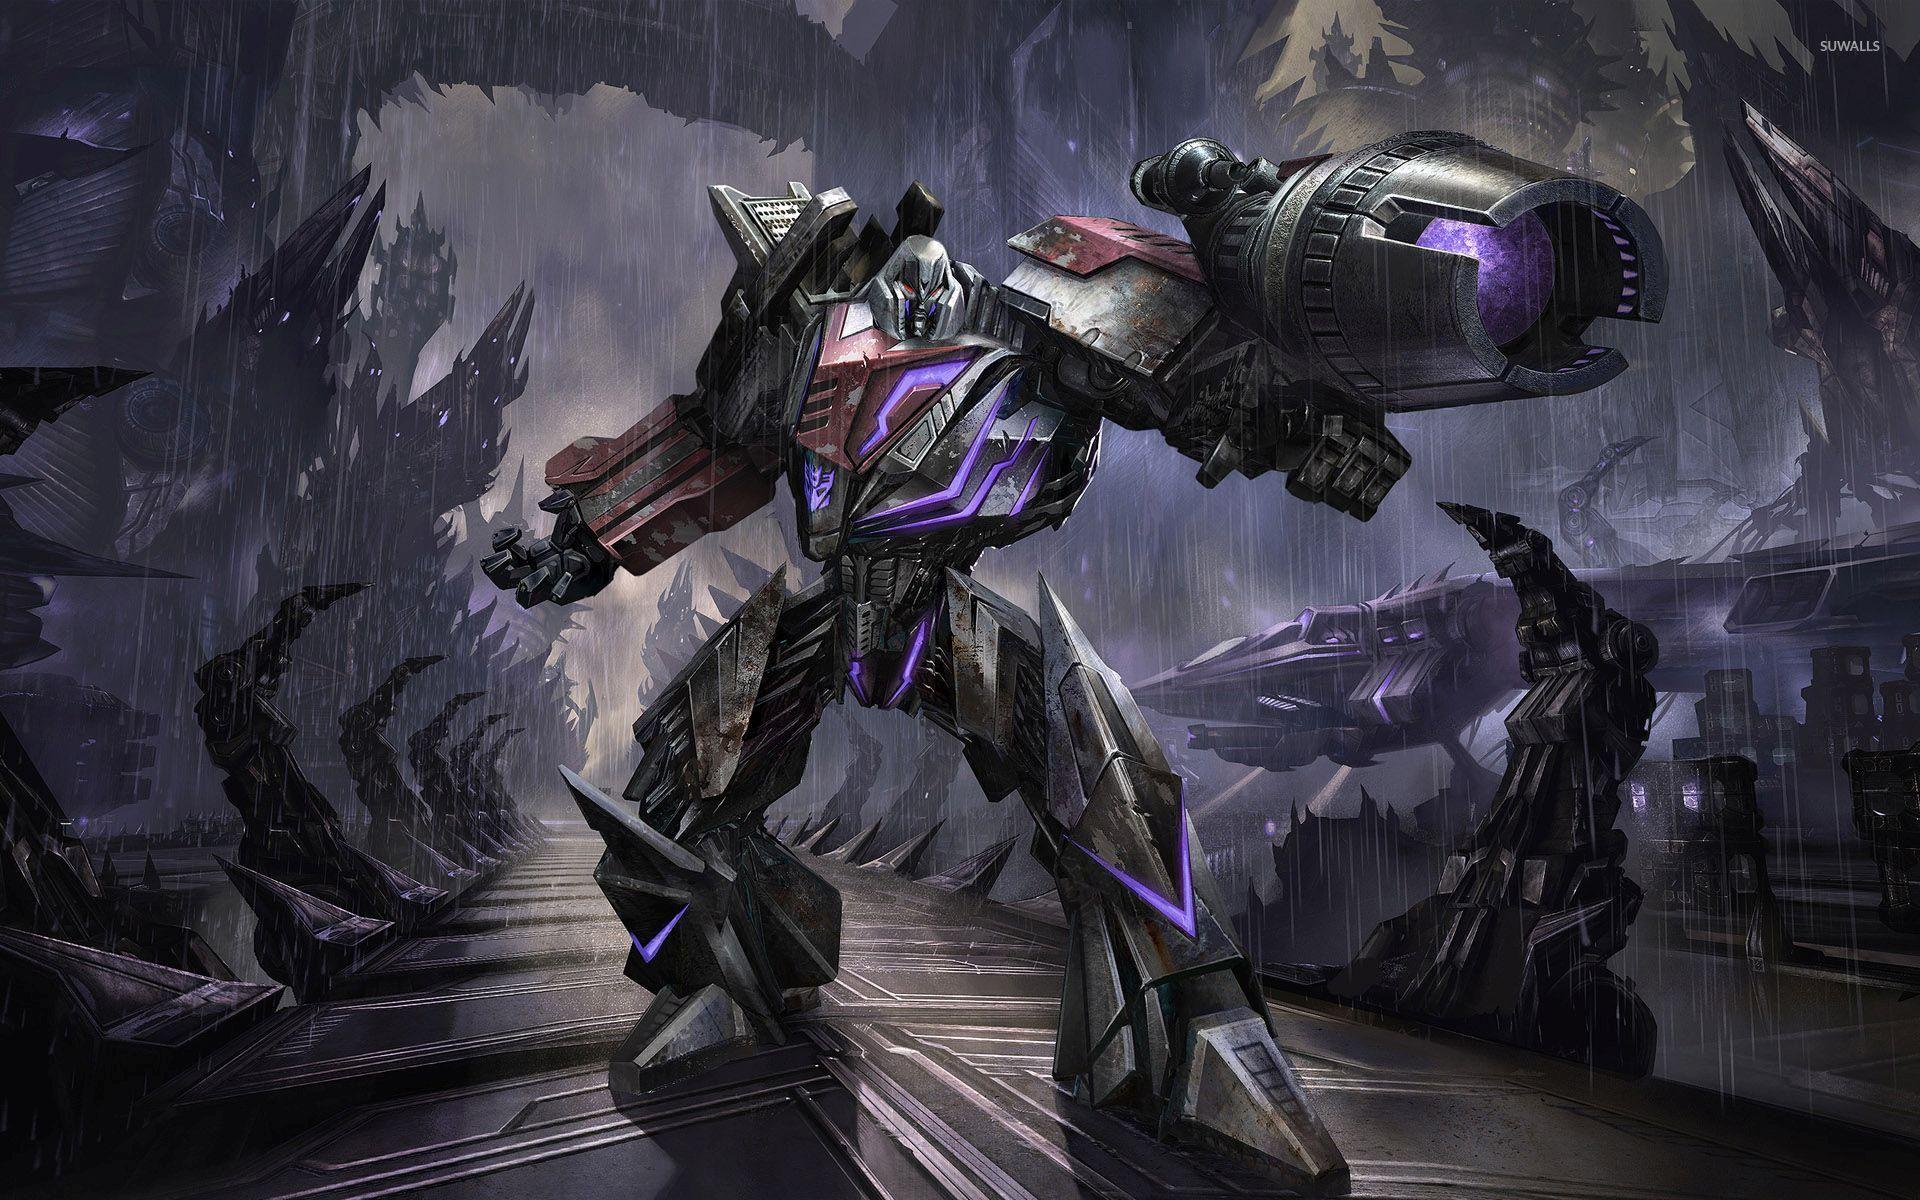 Megatron in Transformers wallpaper